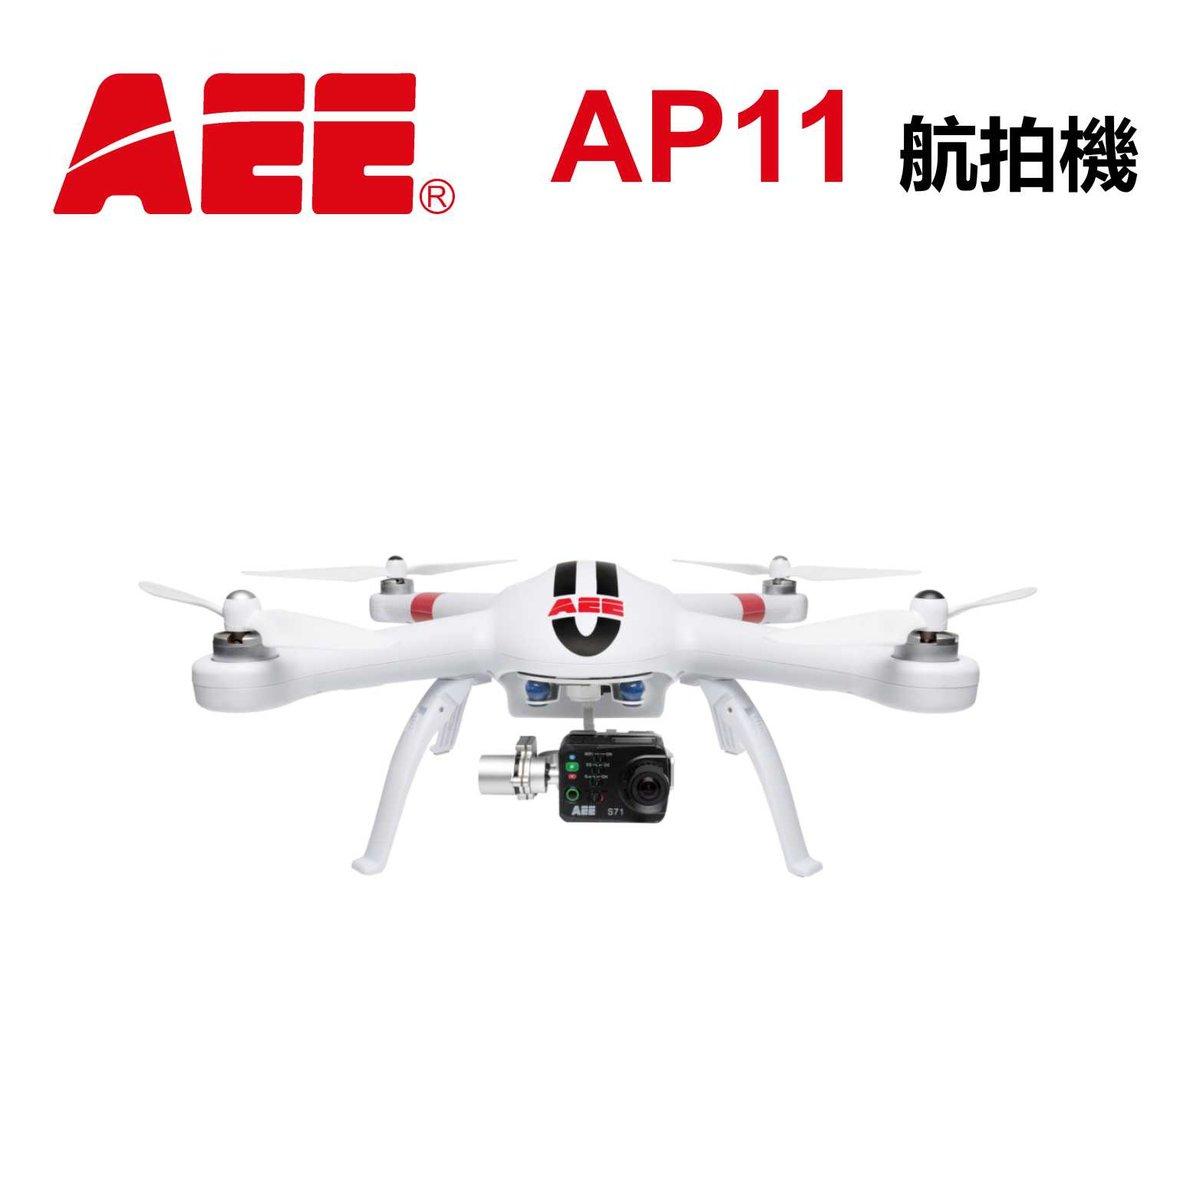 AP11 TORUK 航拍無人機-特配運動攝影機 (型號: AP11)